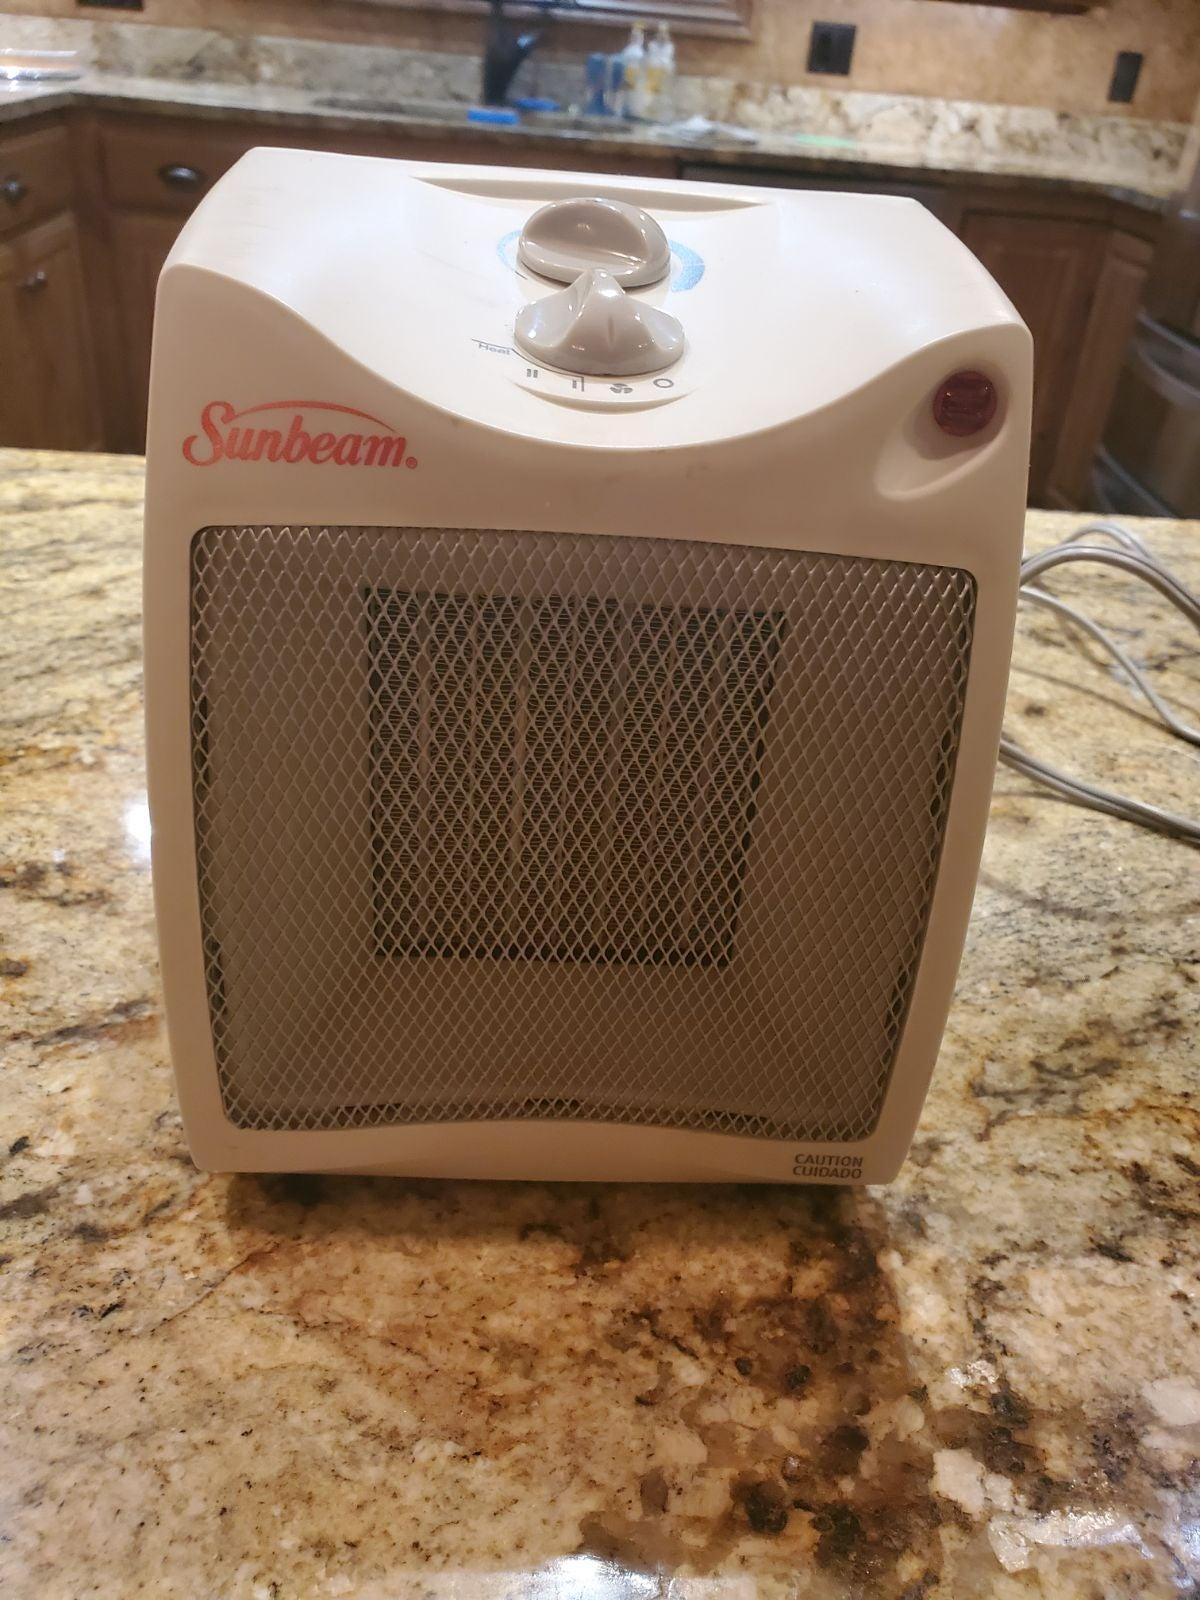 Sunbeam compact fan and heater